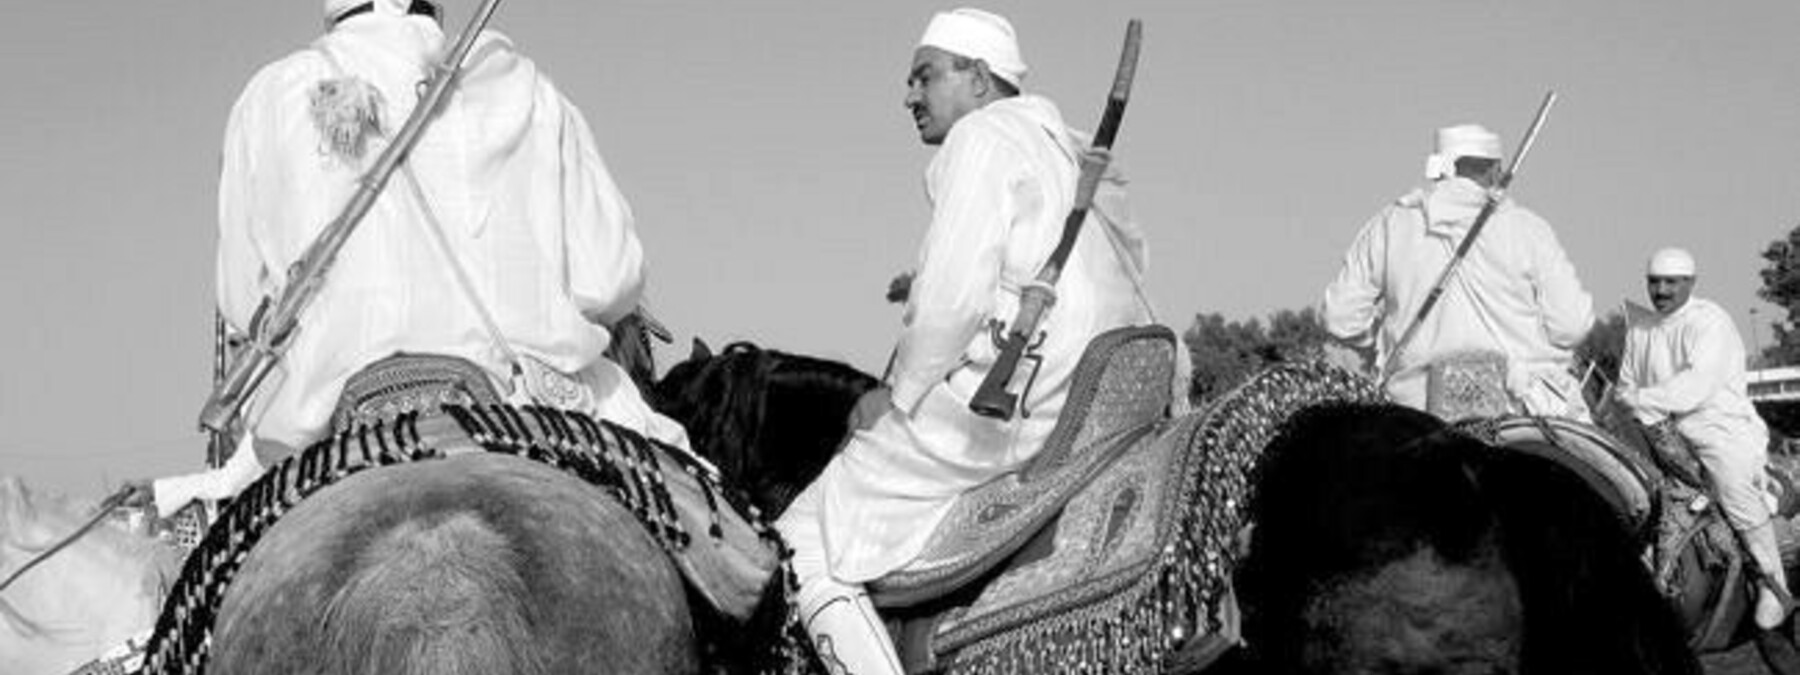 Abdel majid